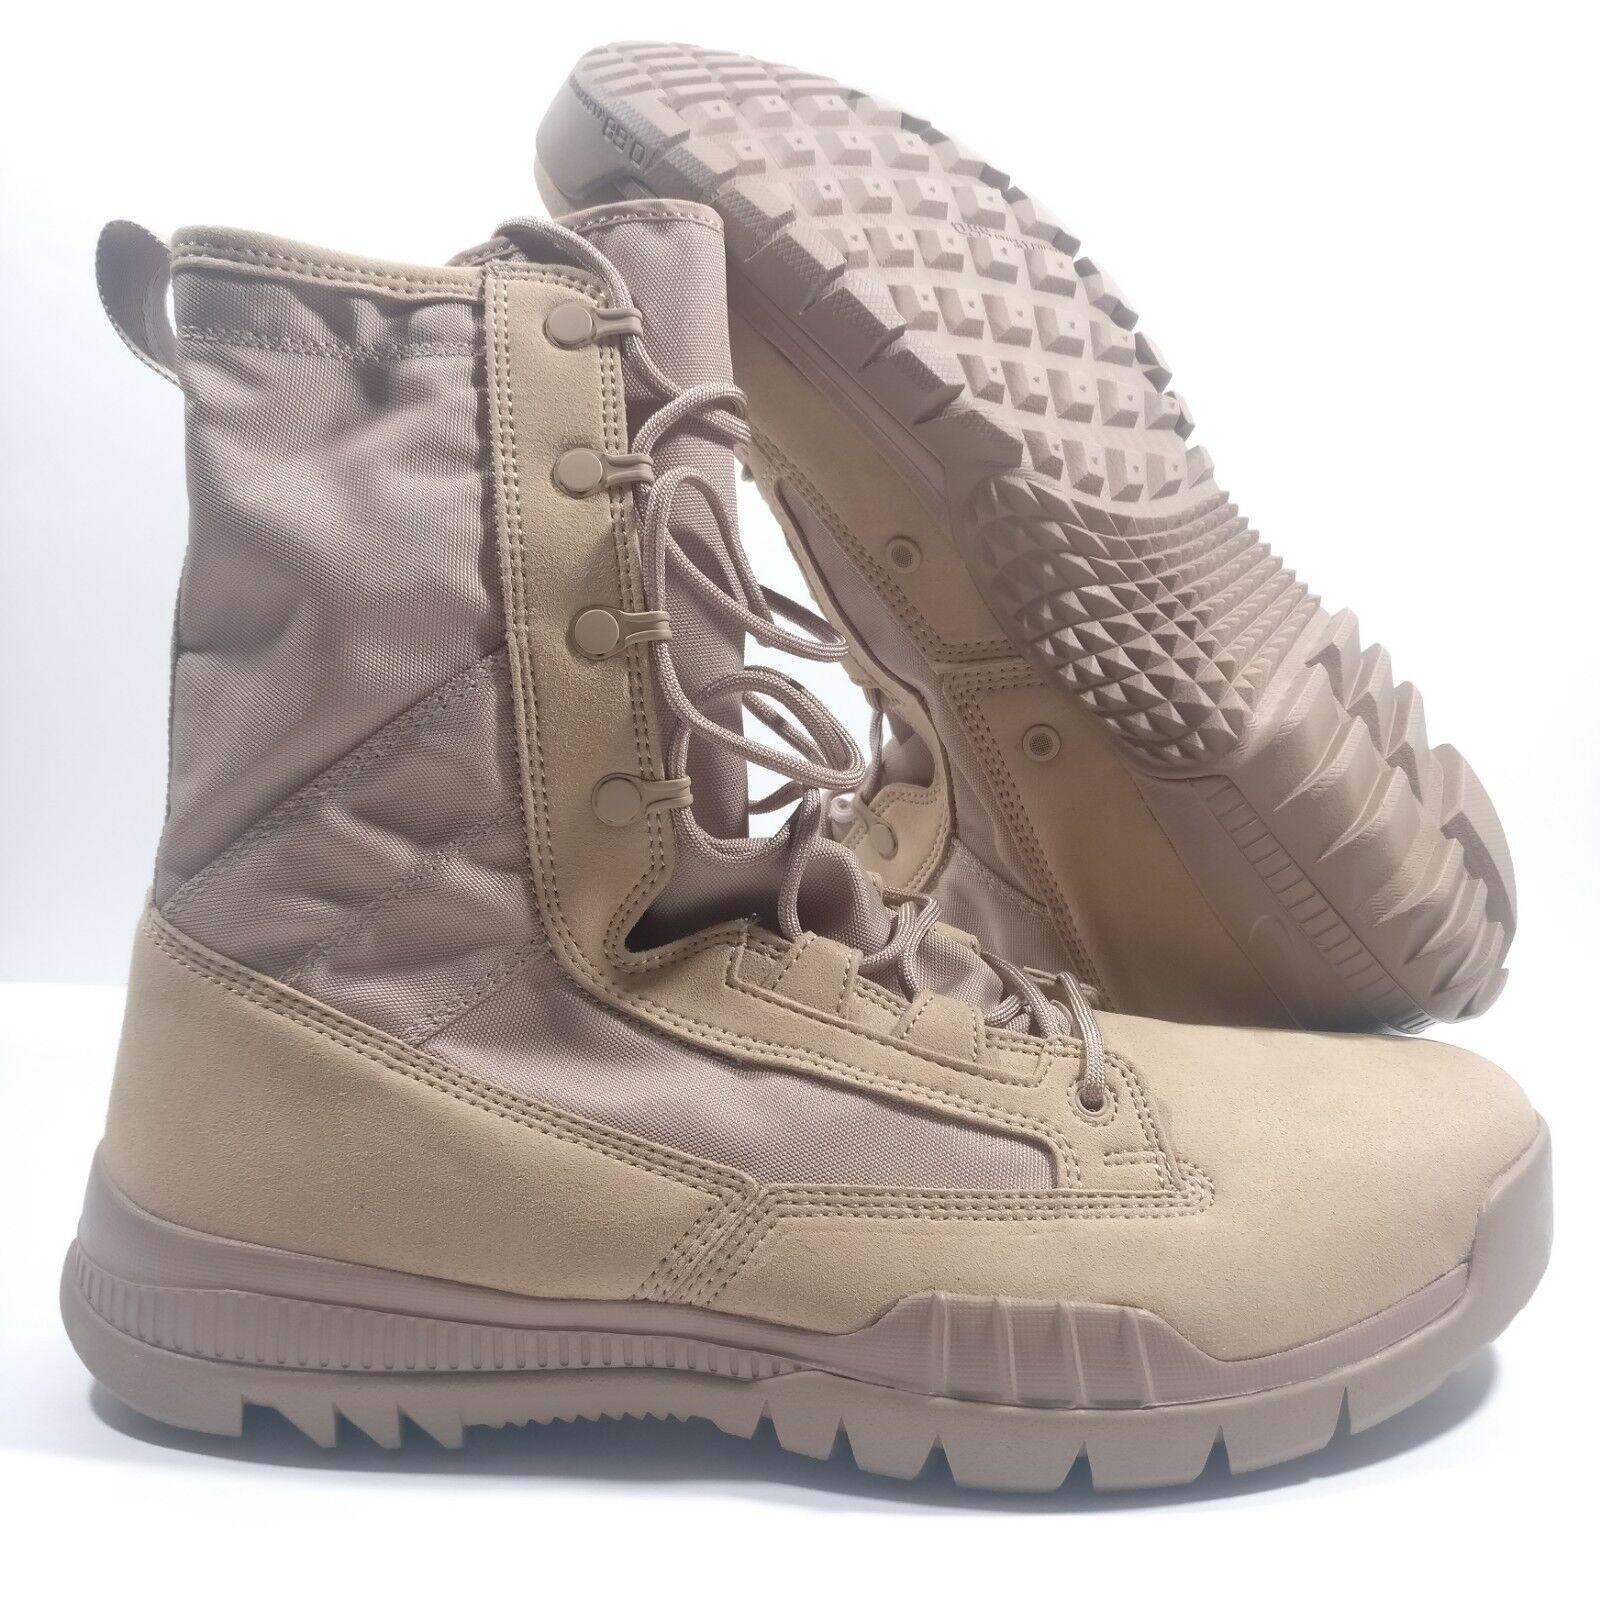 Mens Nike SFB Special Field Boot 8  Military British Khaki 631371-220 Multi Size